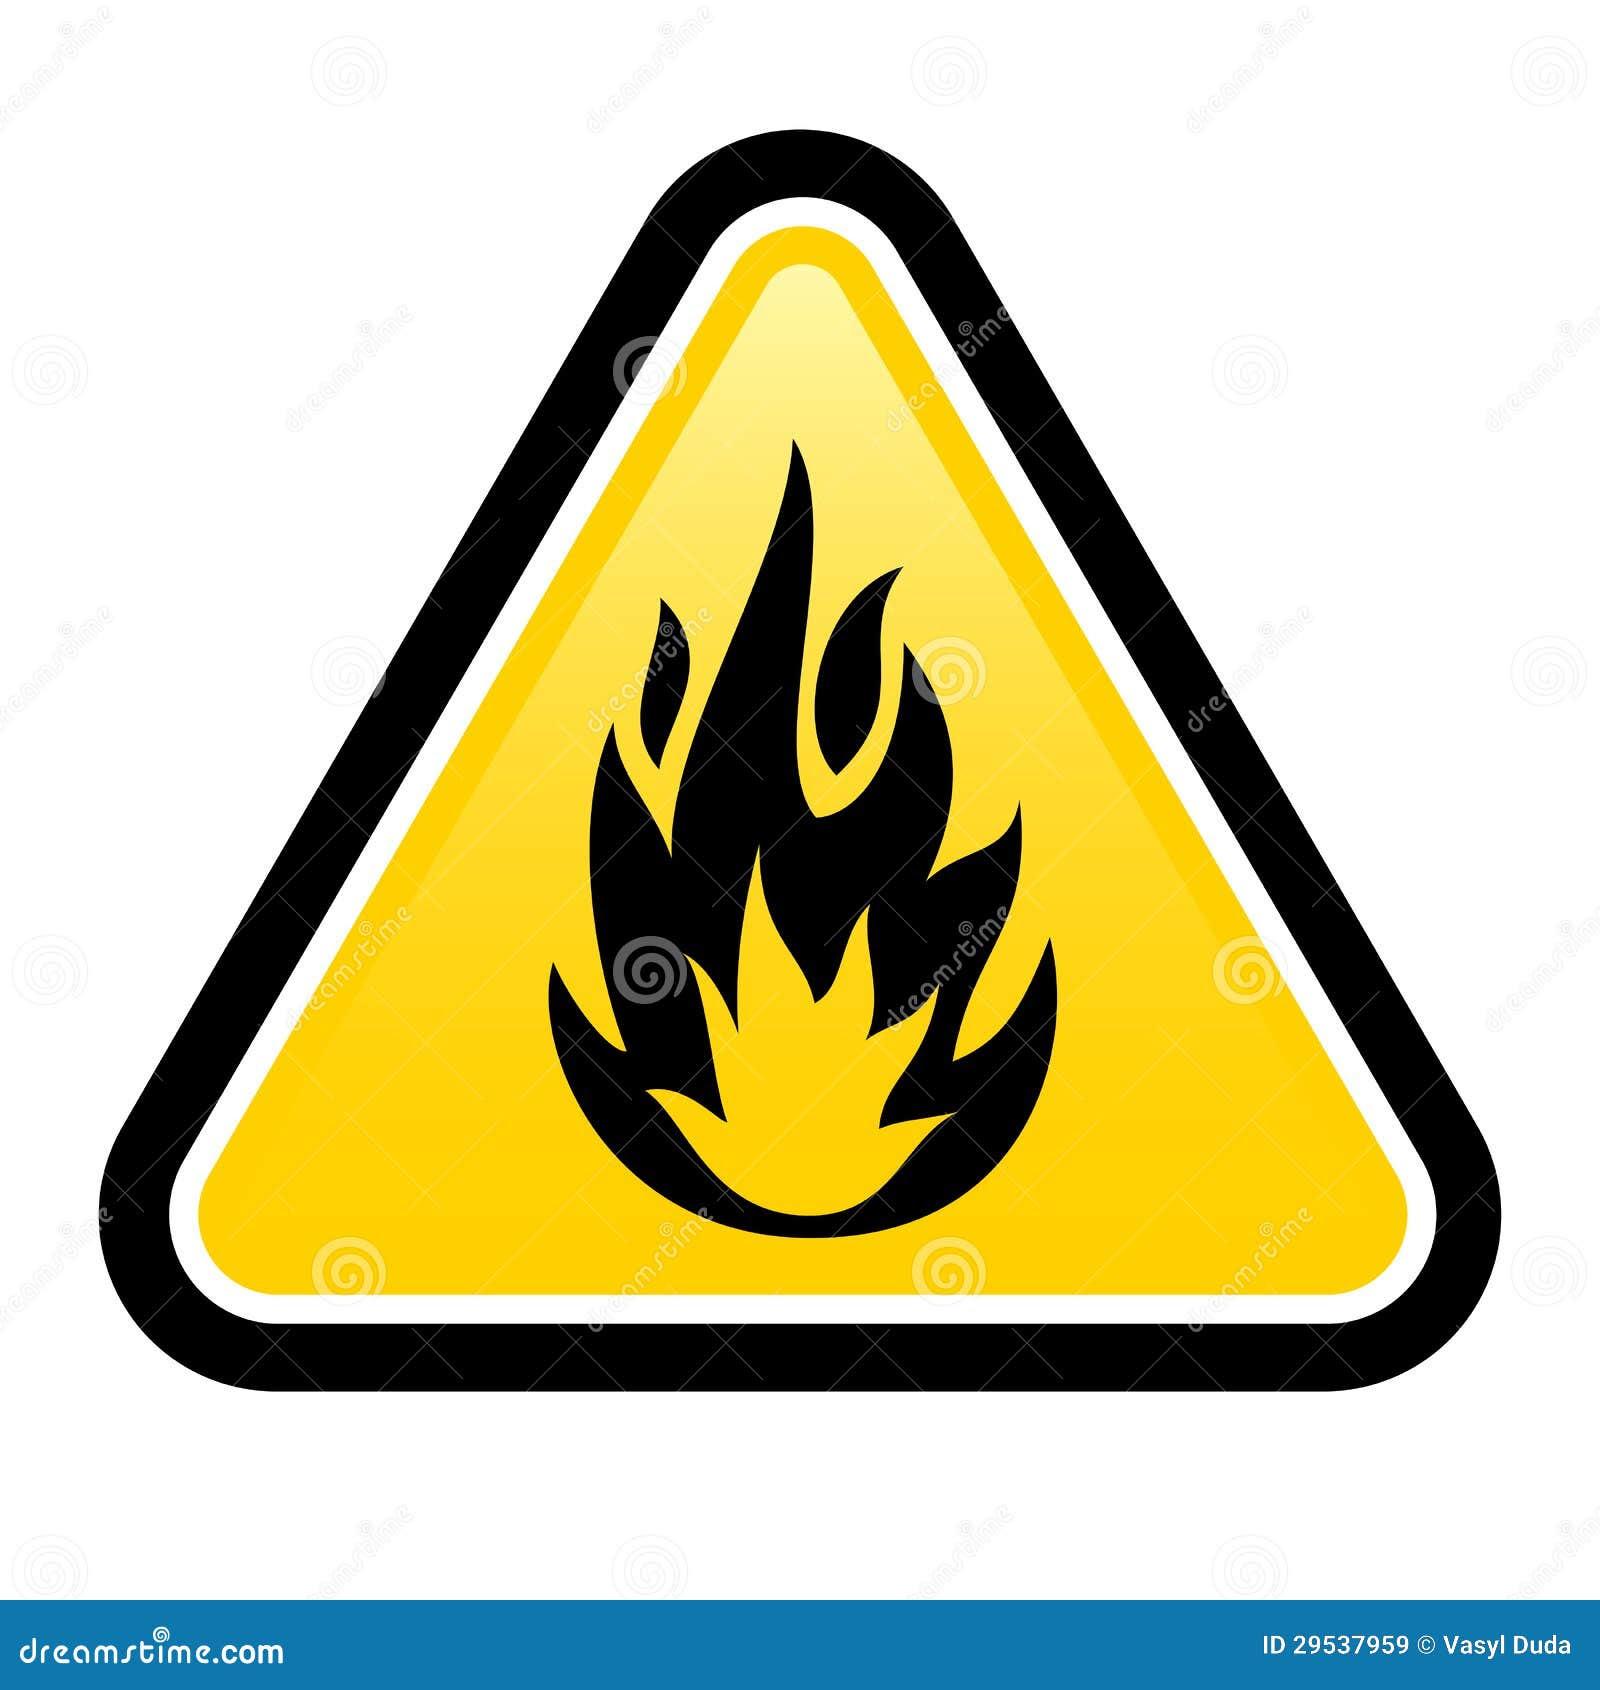 flammable-29537959.jpg (1300×1390)